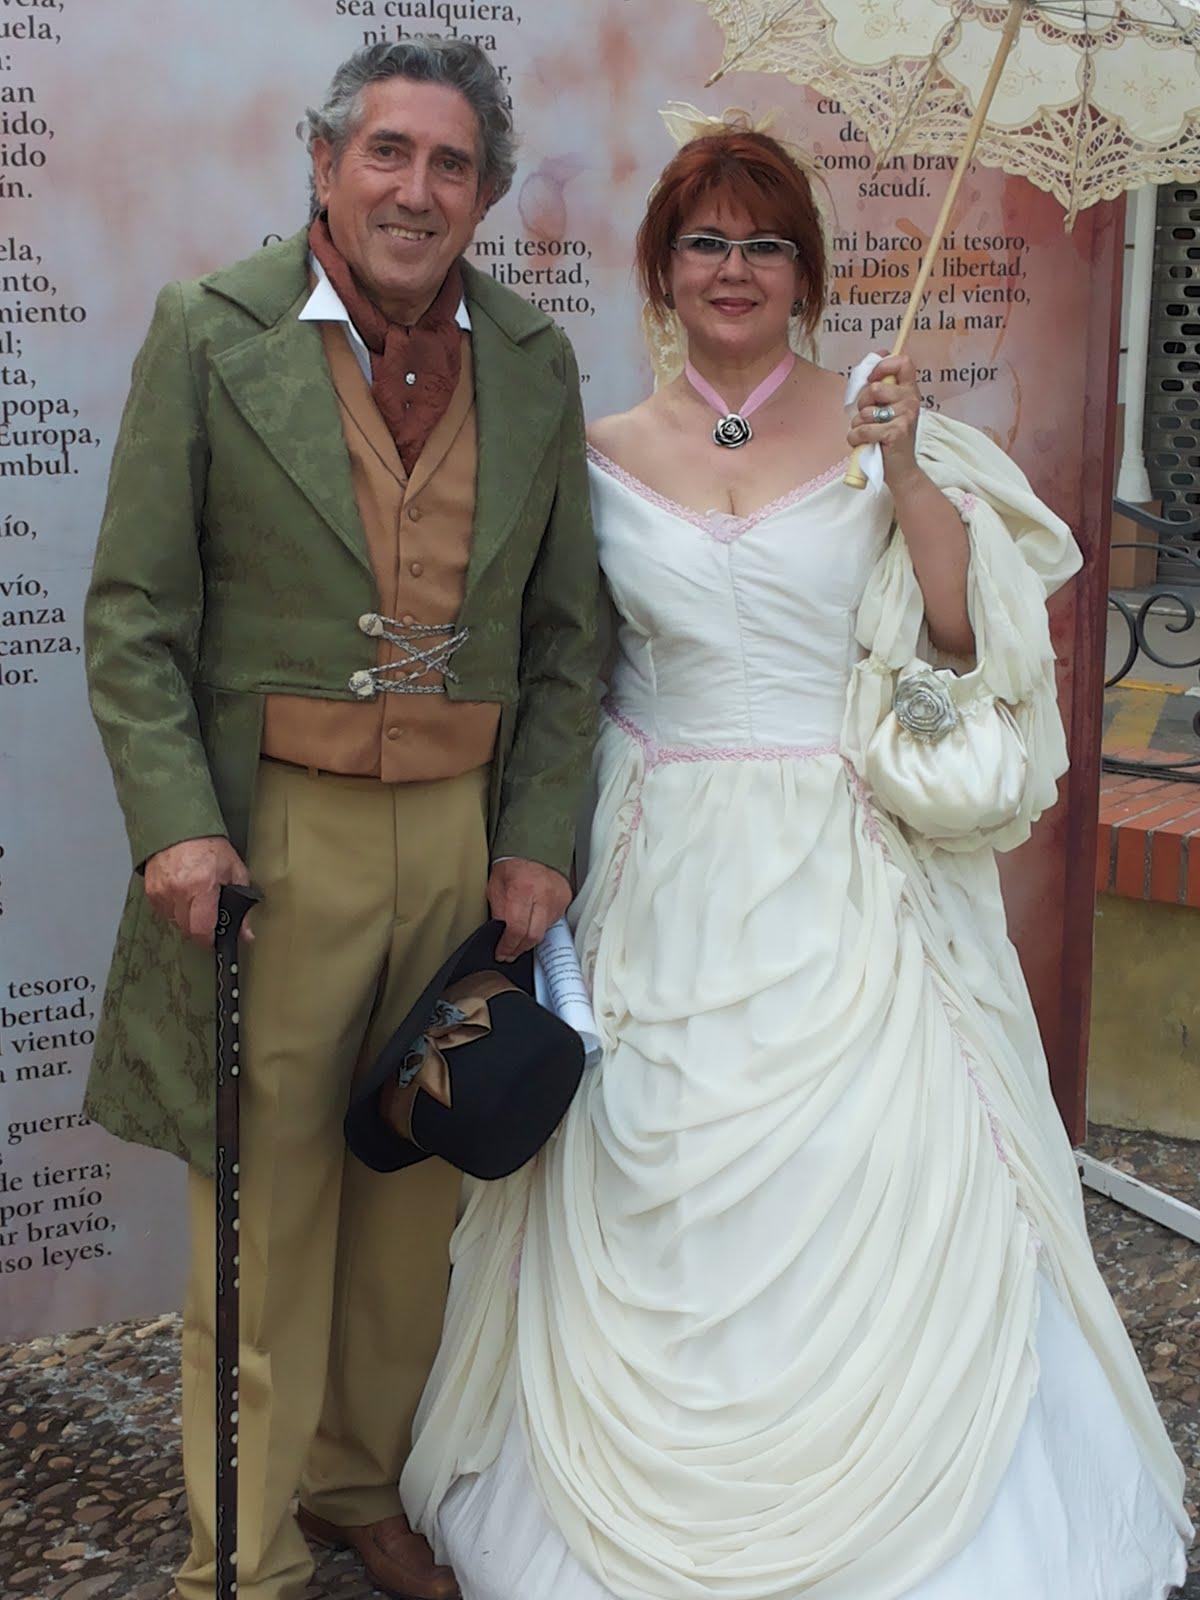 Ruta del Romanticismo, en Almendralejo.Con mi marido Juan Manuel del Pozo Jiménez.